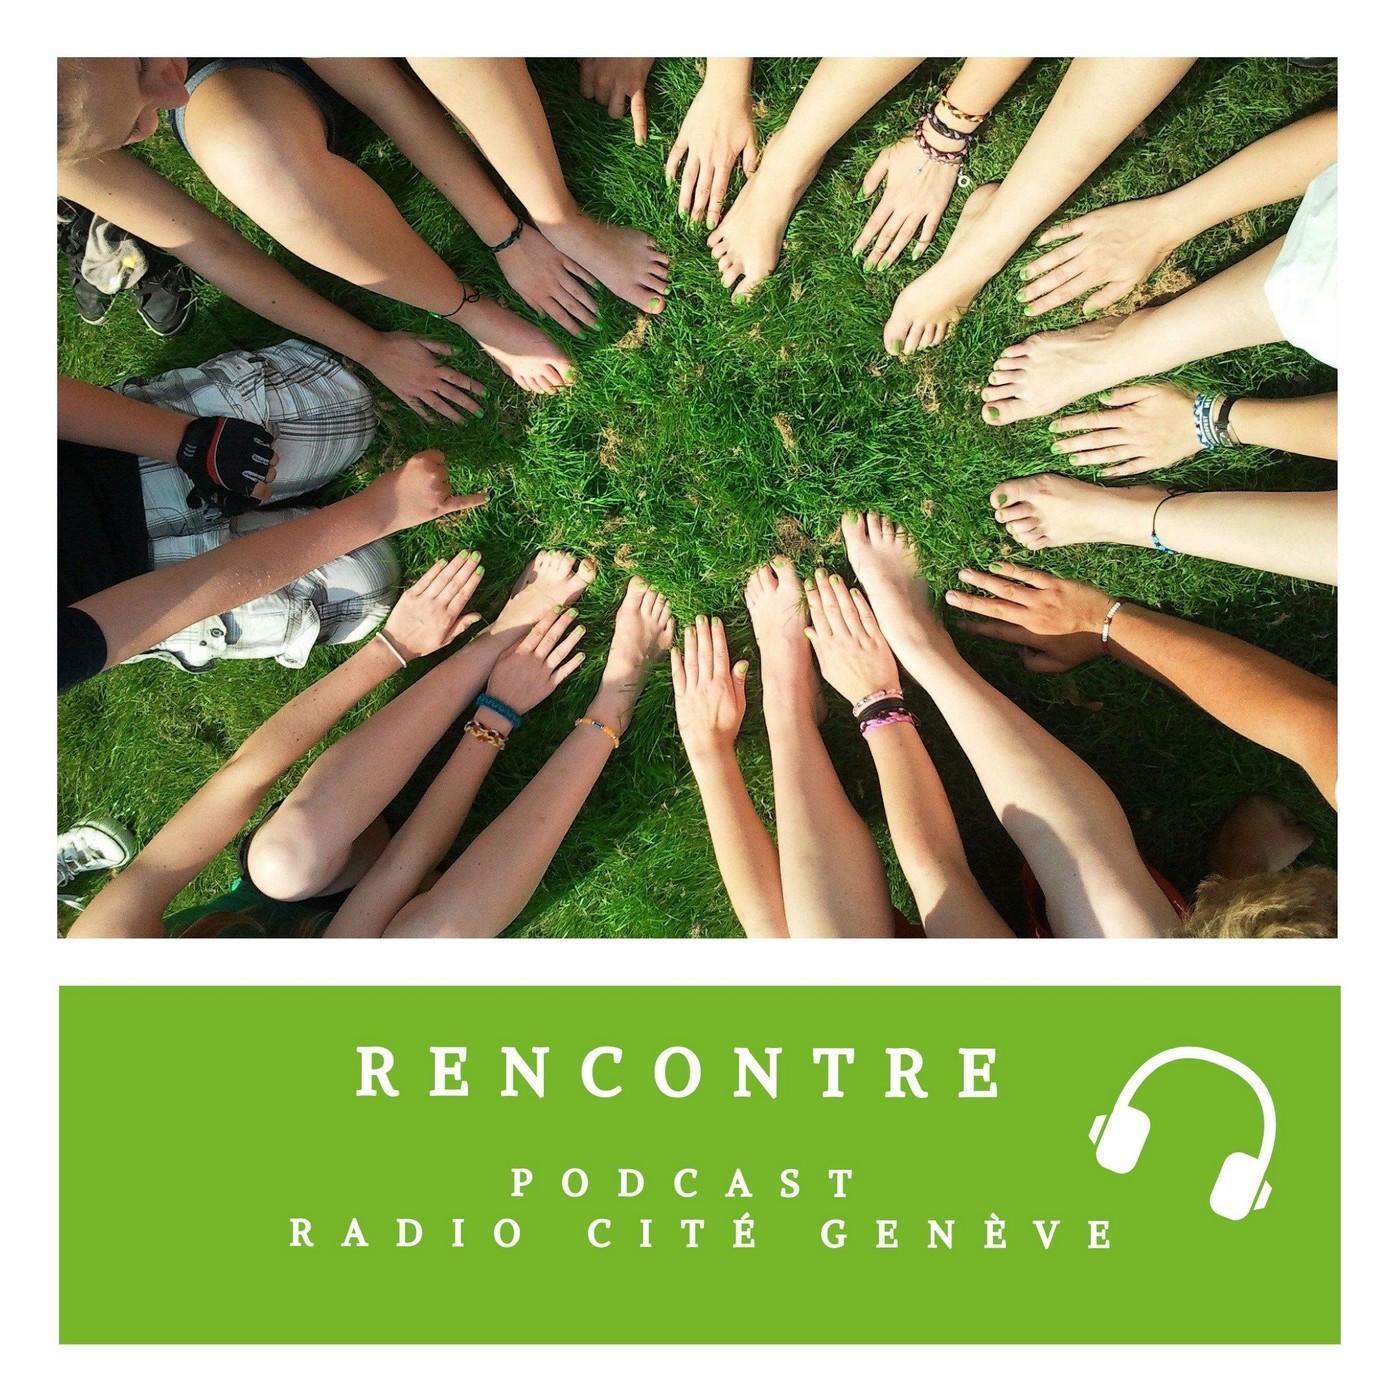 Rencontre du 02/09/2021 -  Didier Grandjean